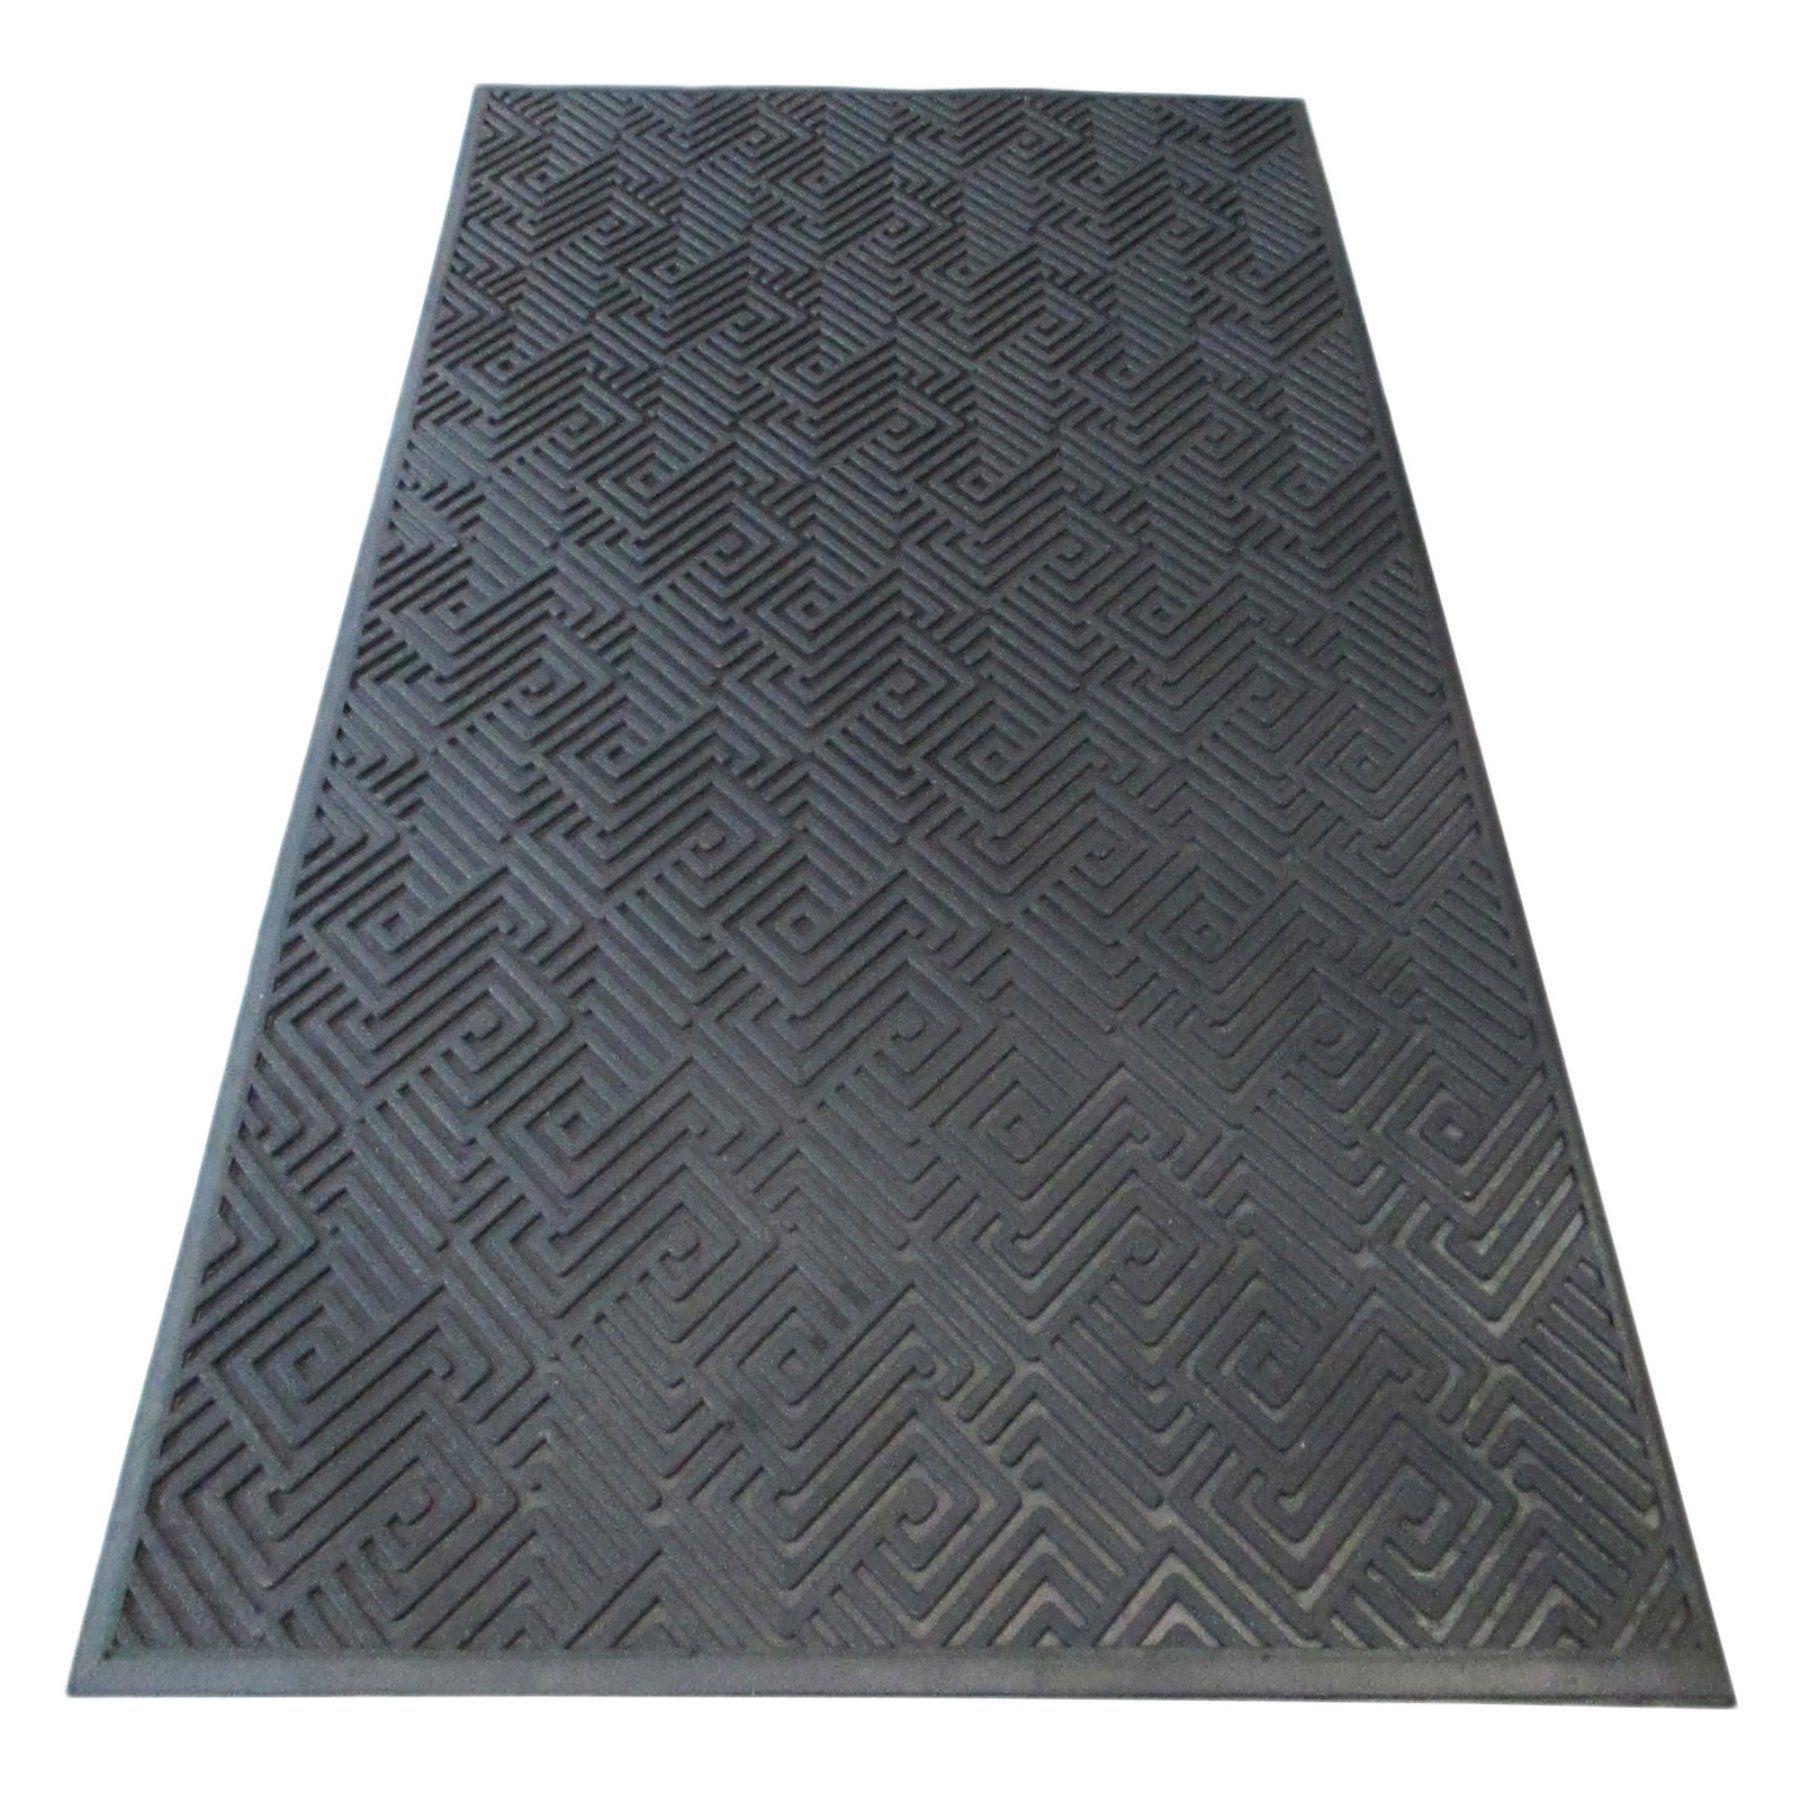 A1 Home Collections Maze Natural Rubber Scraper Doormat A1hcsm10 Maze Design Door Mat Natural Rubber